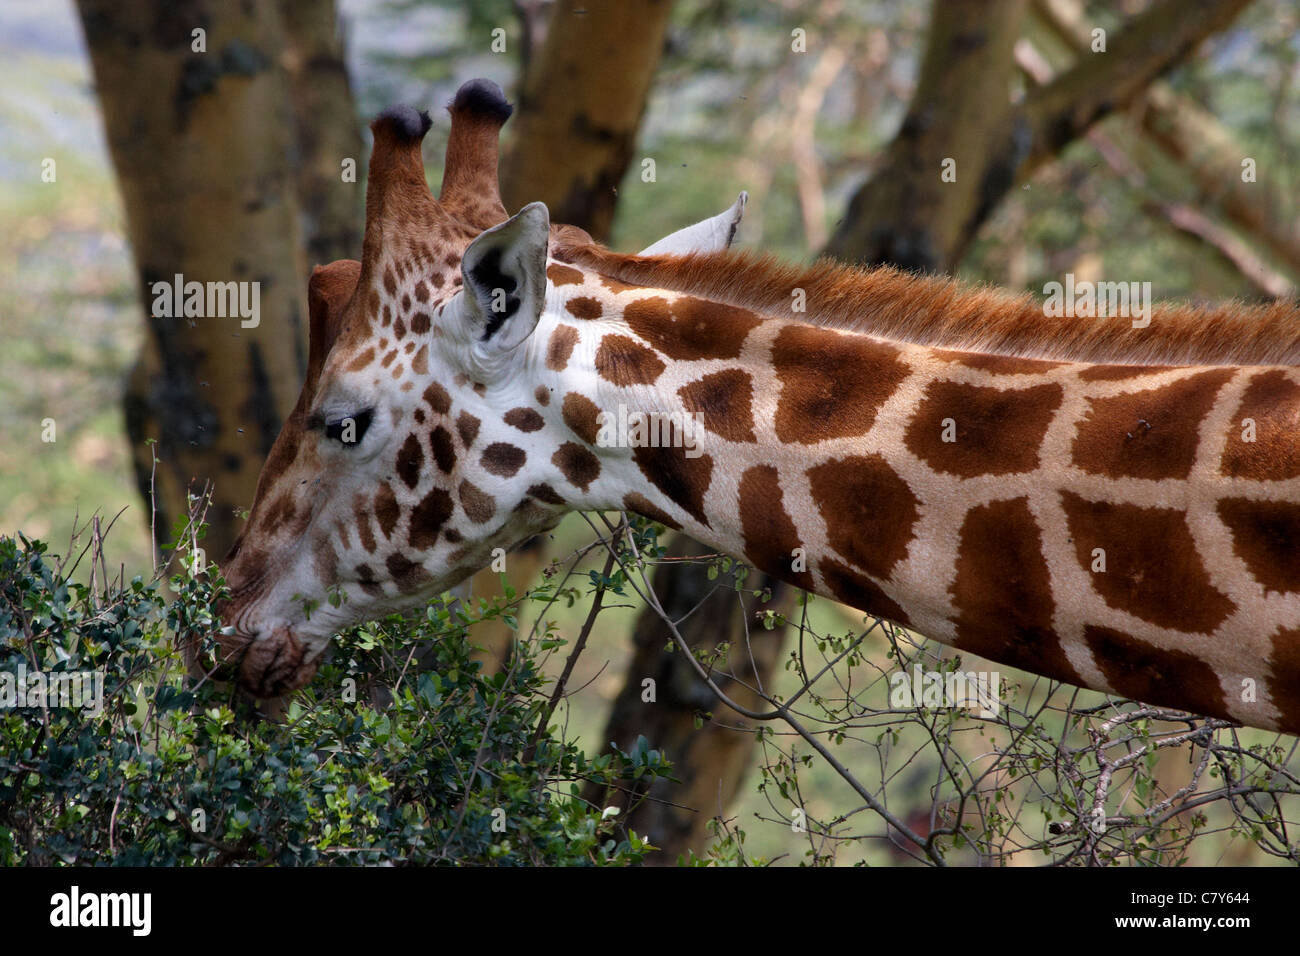 Rothschild's Giraffe (Giraffa camelopardalis rothschildi) browsing - portrait - Stock Image